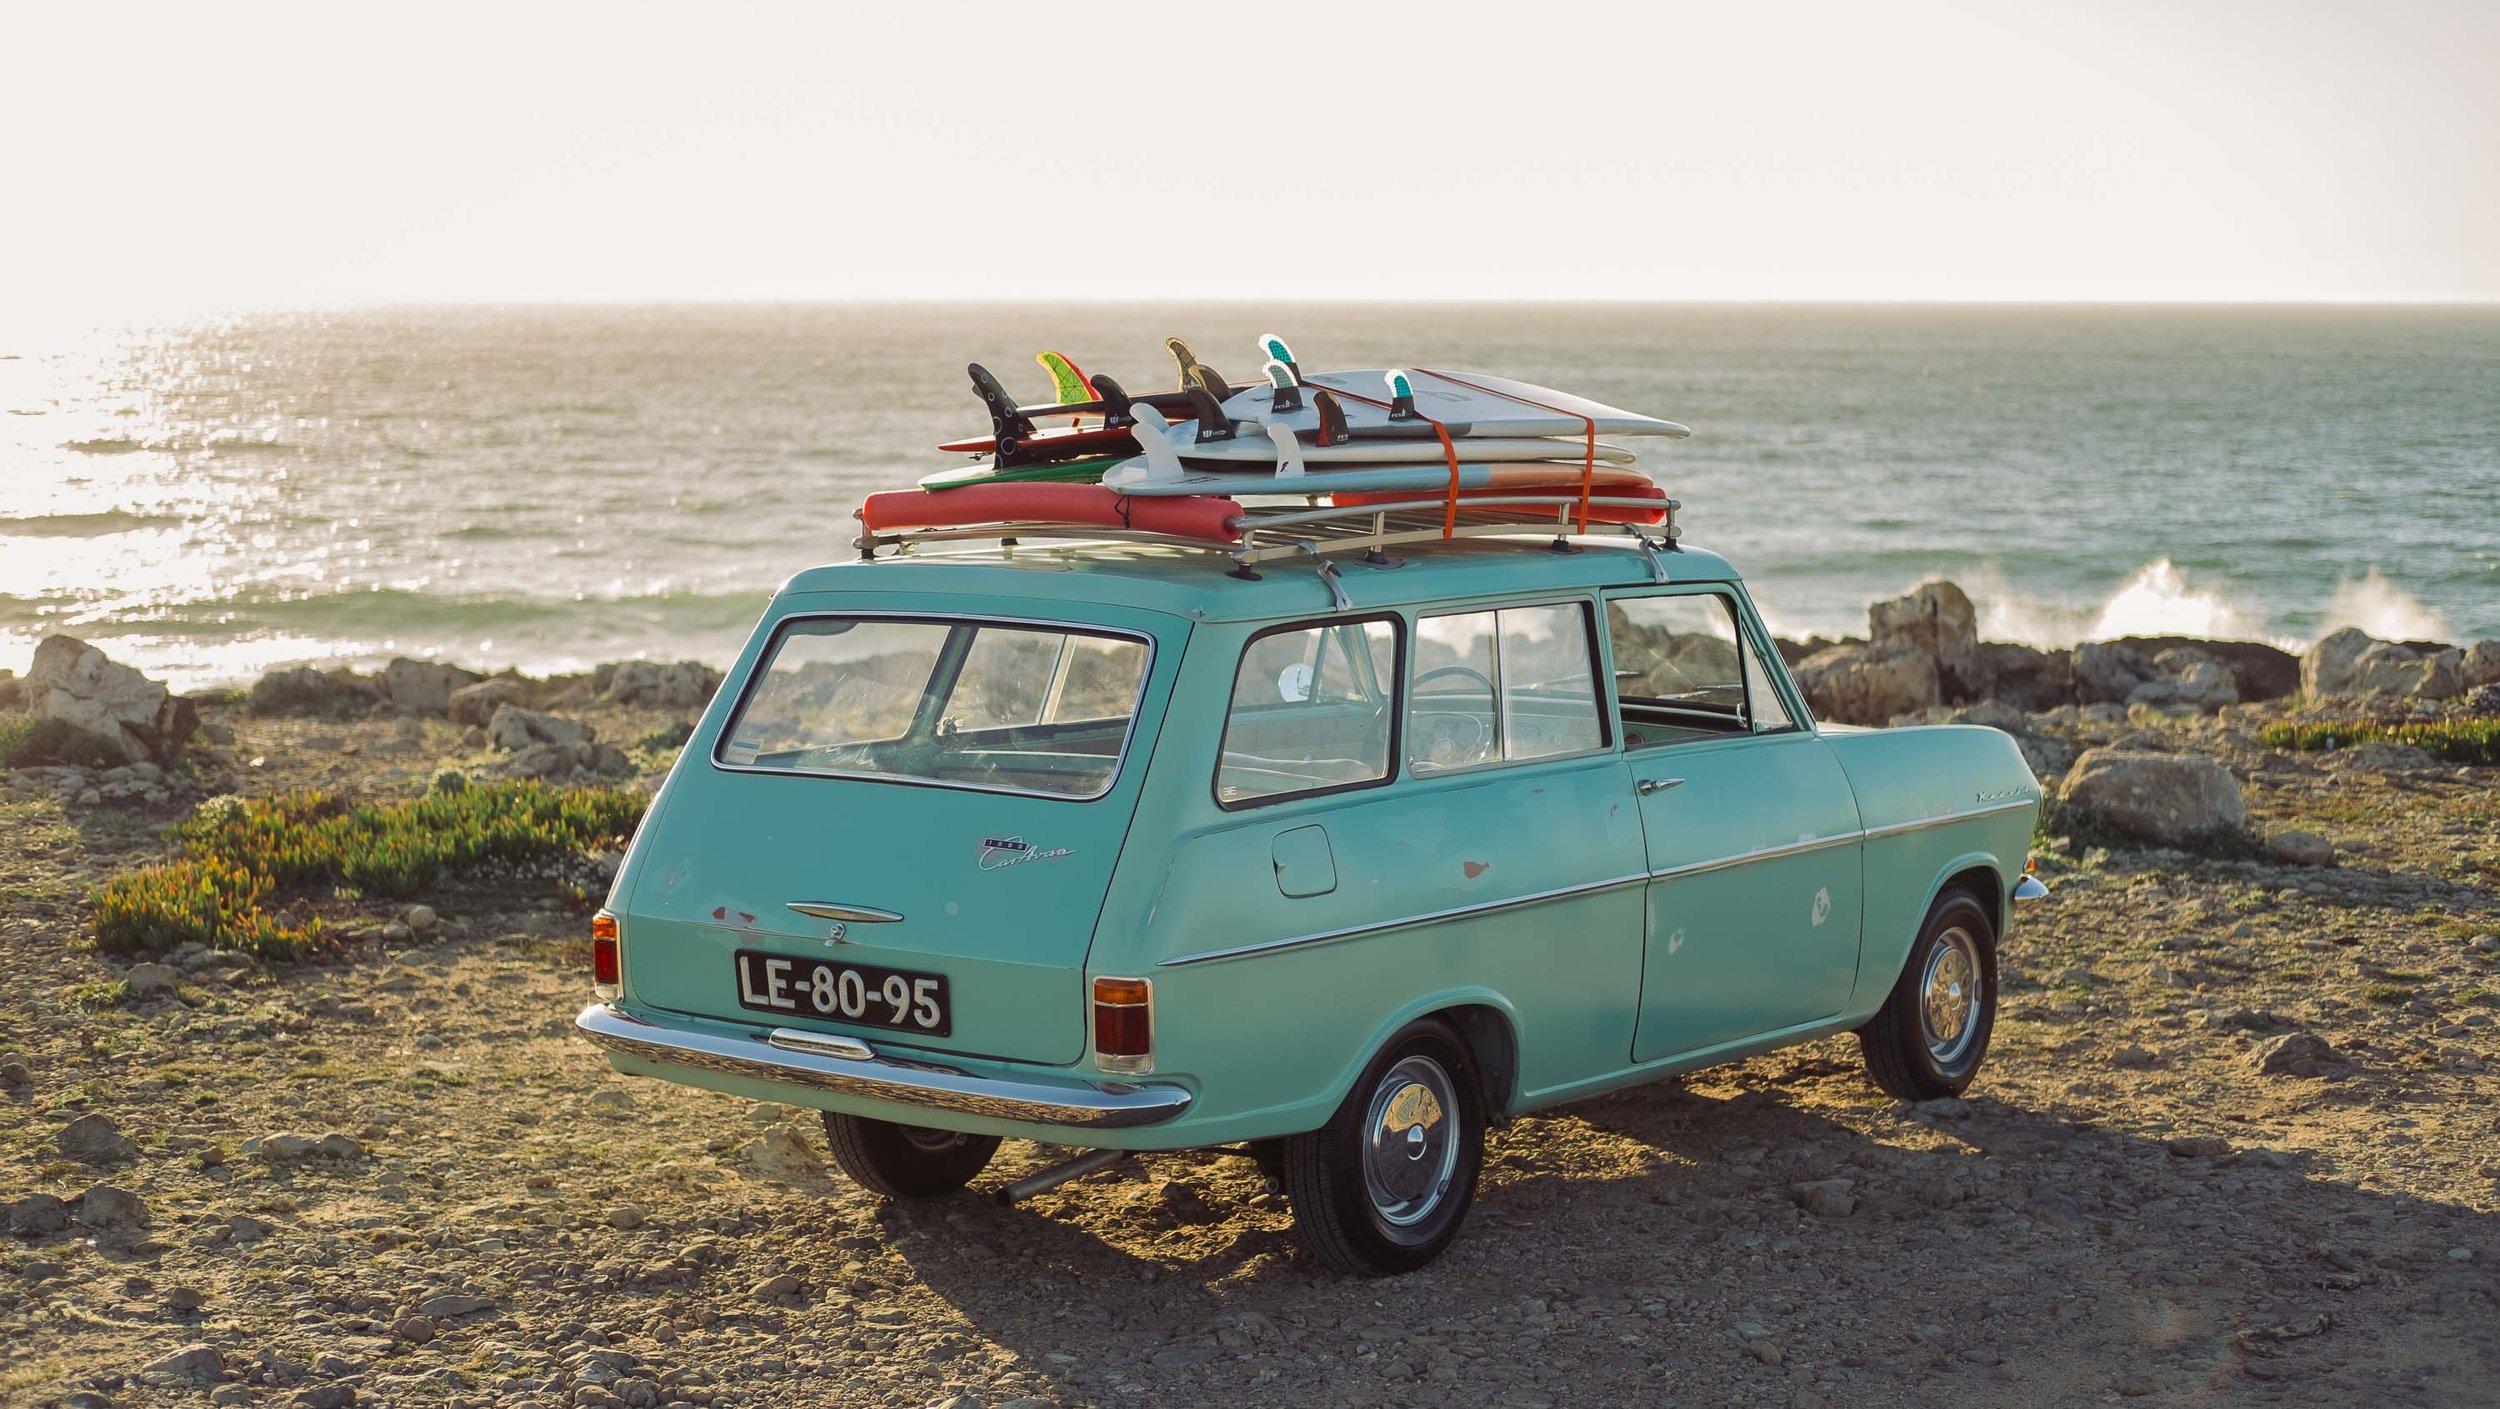 coolnvintage Opel Kadett caravan 1000 (47 of 63).jpg